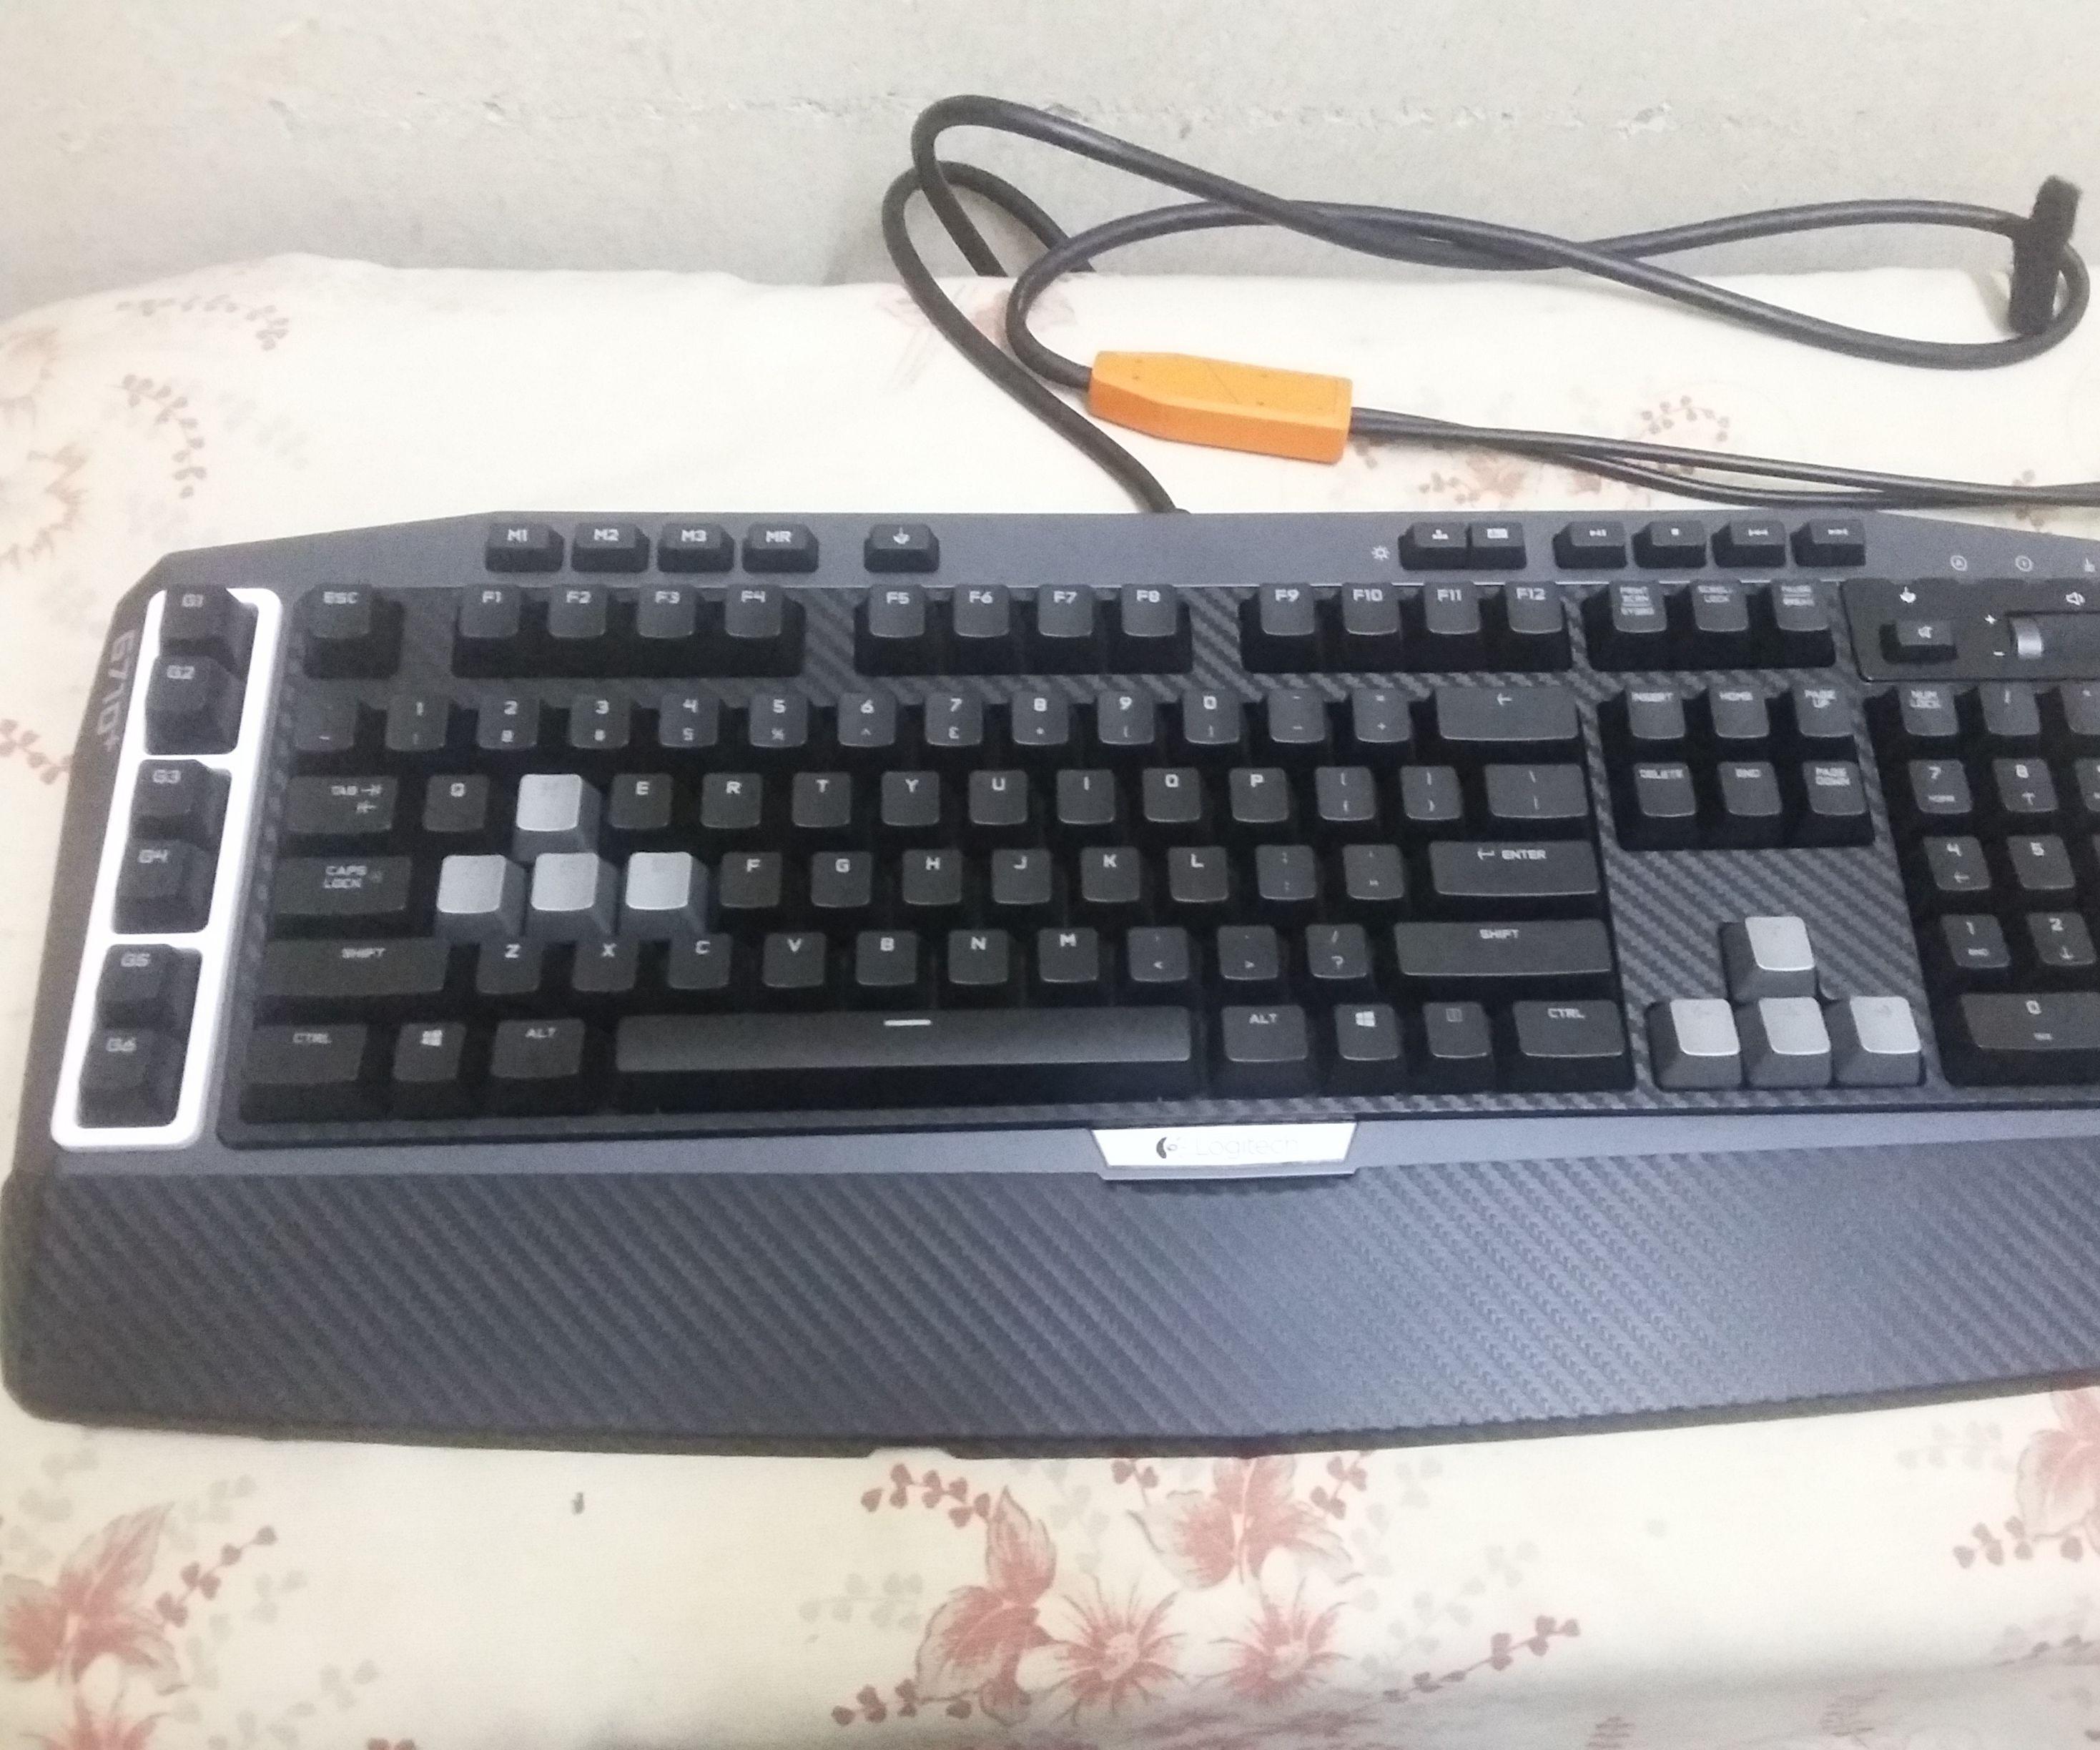 How to open a Logitech G710+ Mechanical Gaming keyboard & Modify